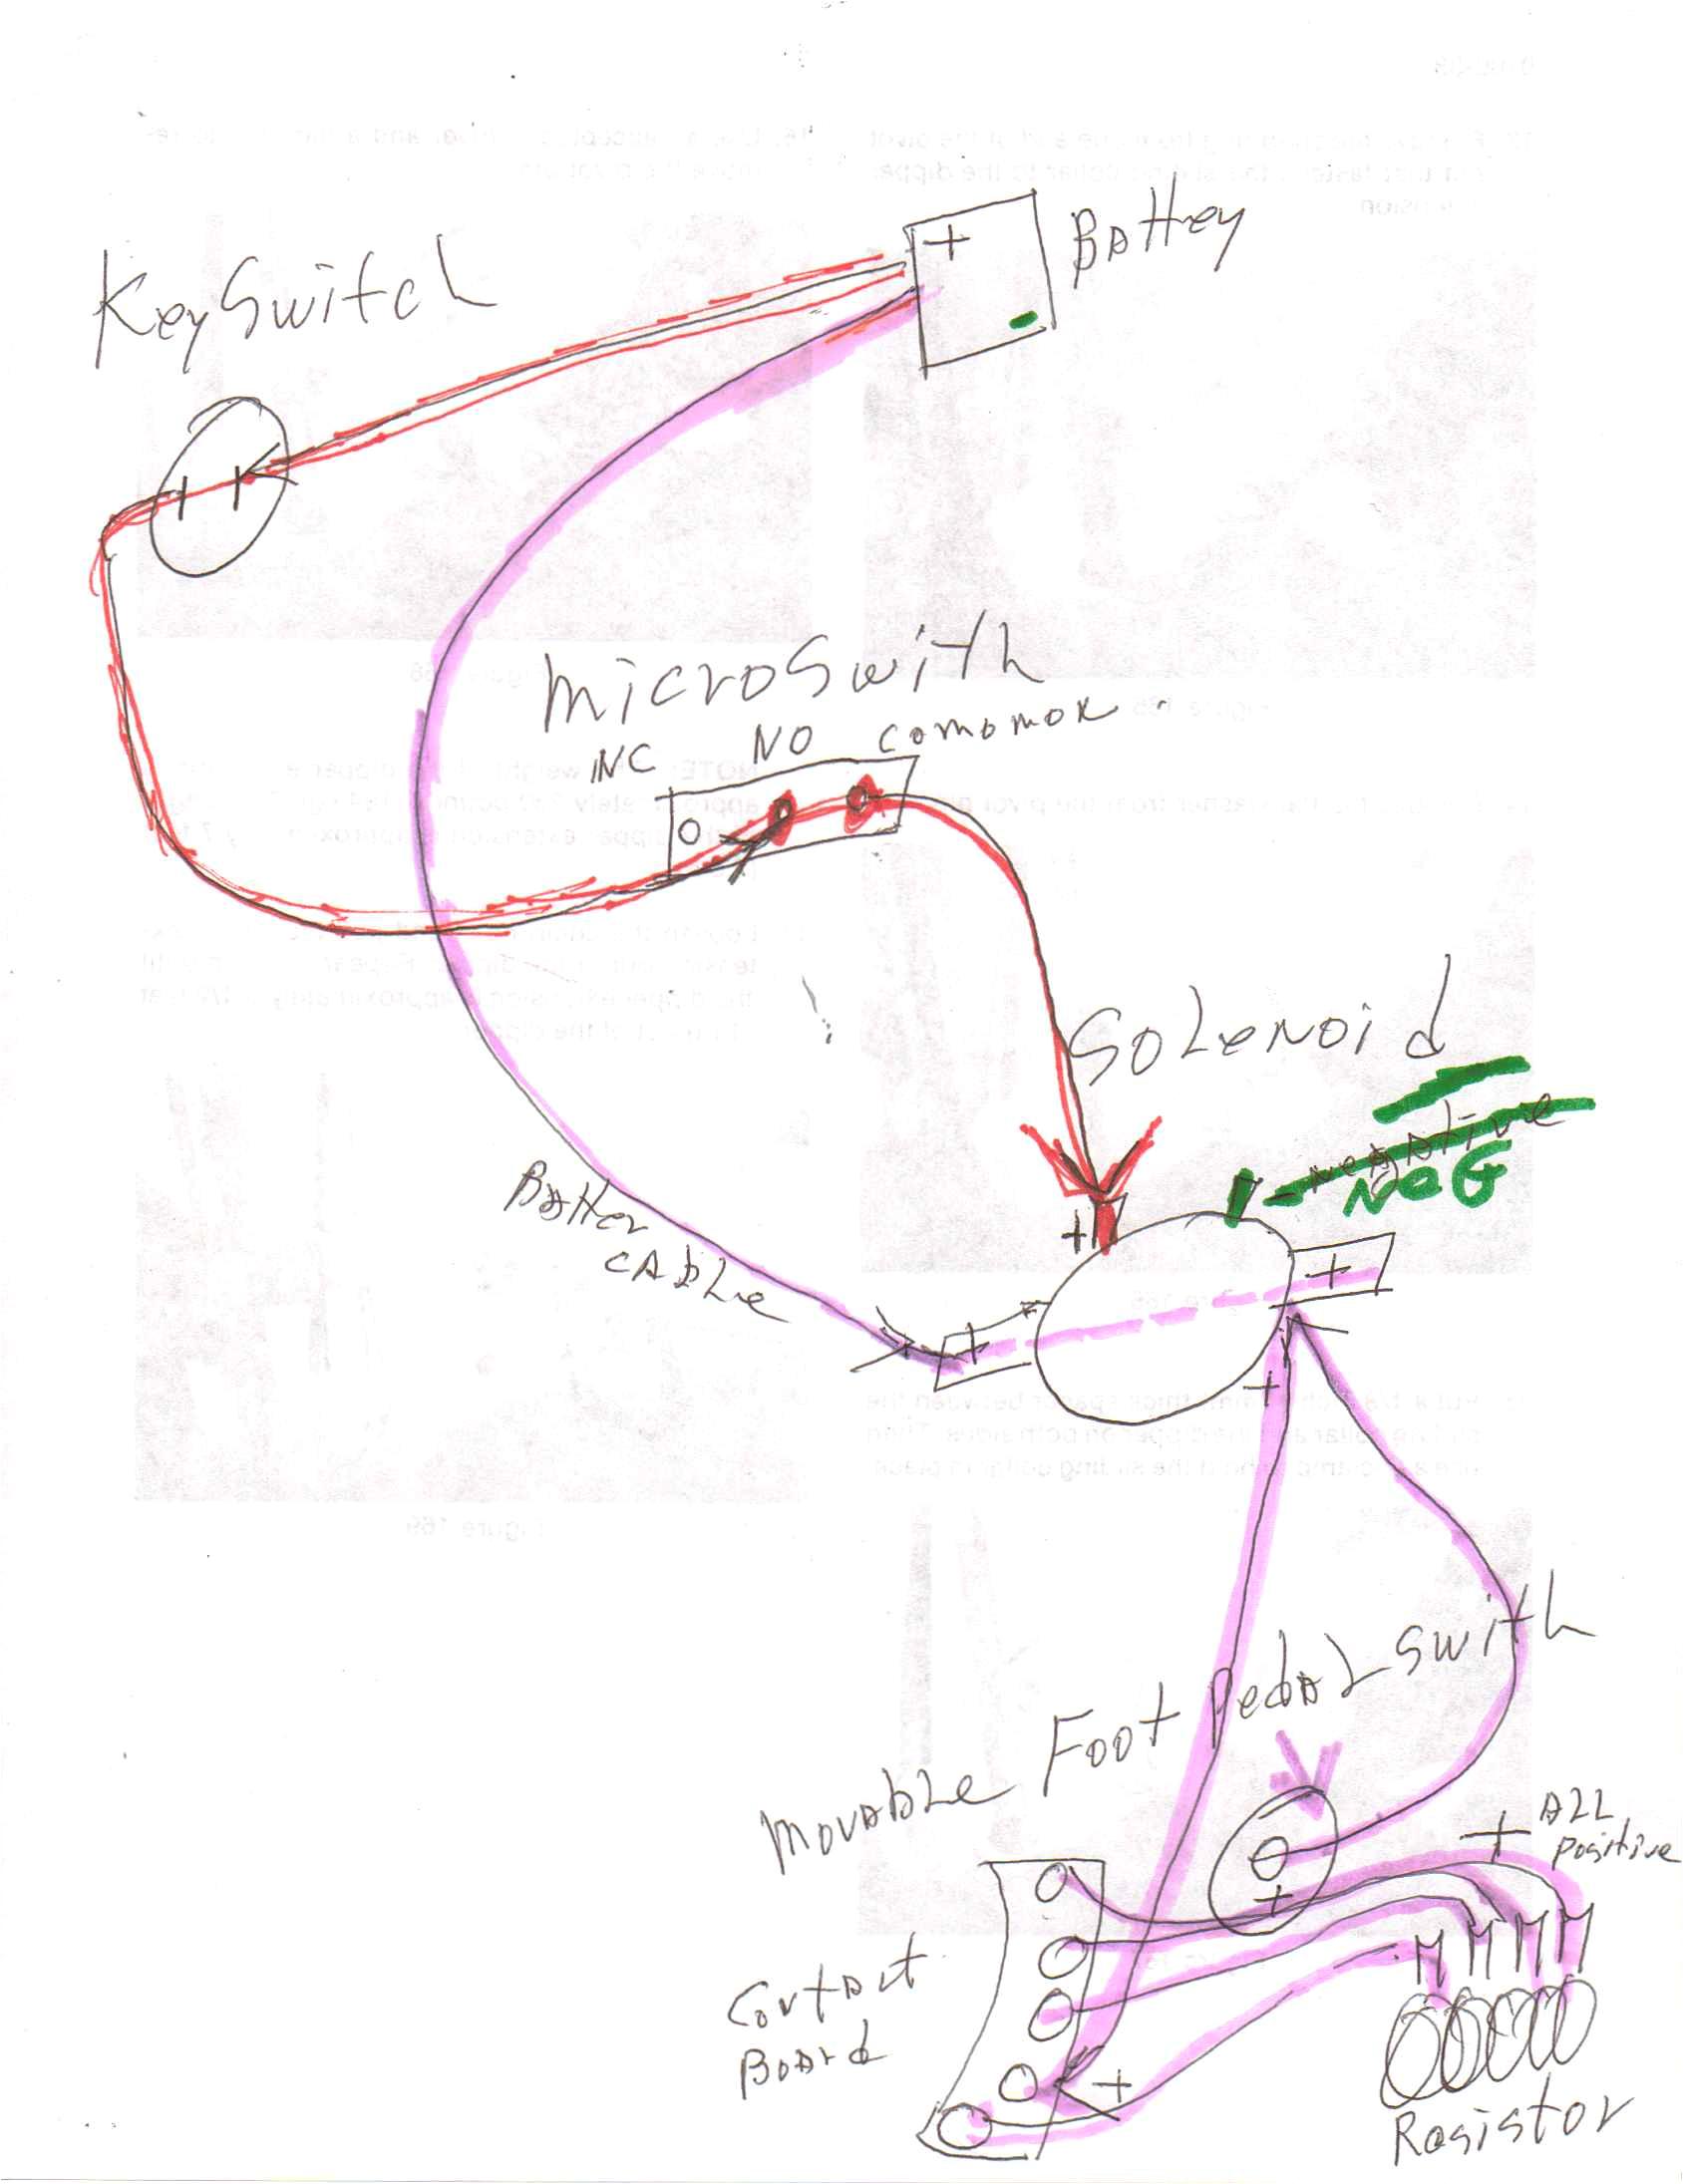 ezgo starter generator wiring diagram in golf cart gas for ezgo ezgo wiring diagram